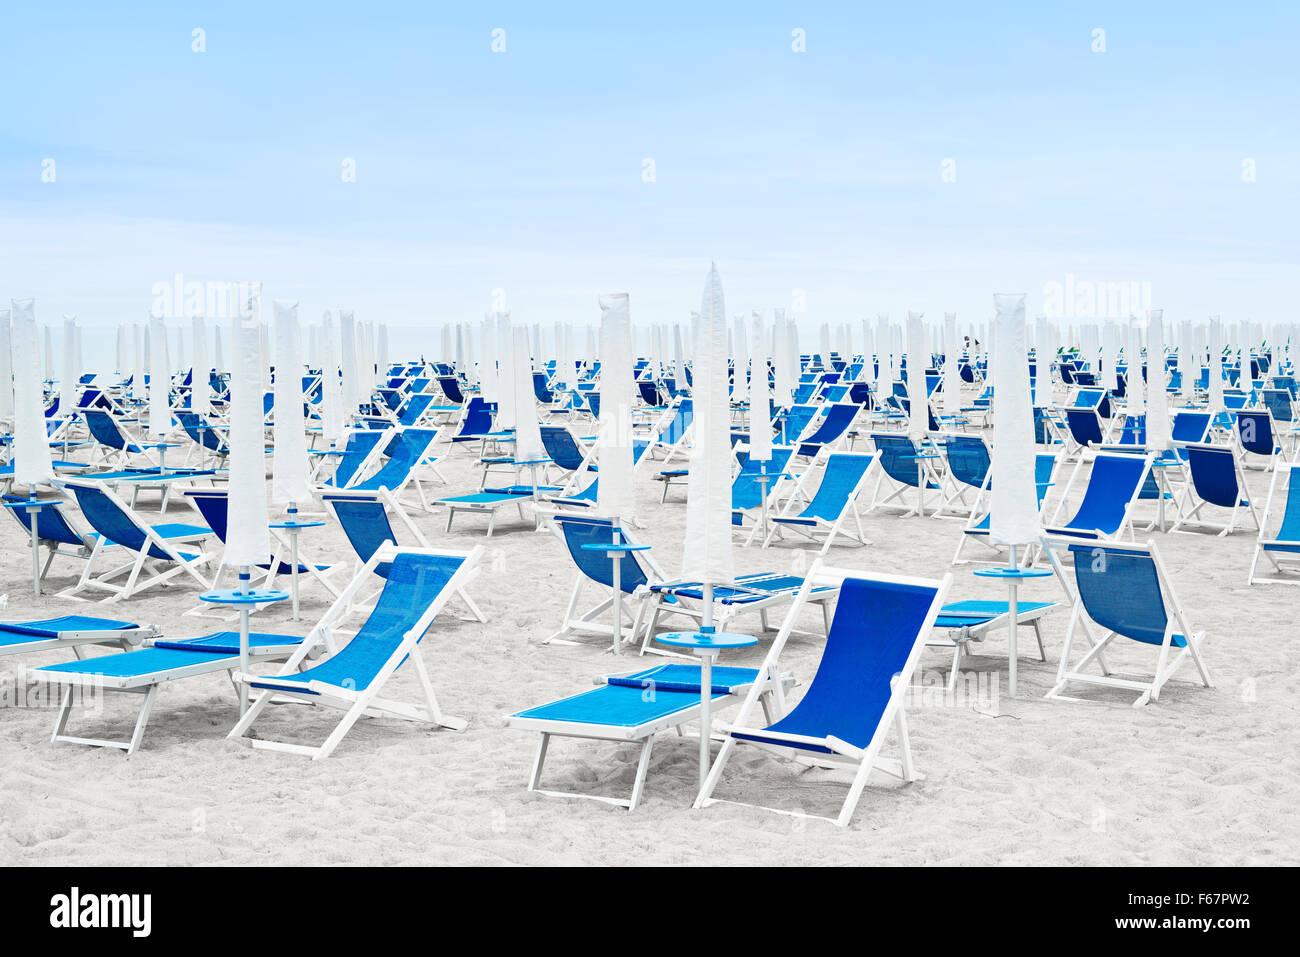 Beach umbrellas closed and blue deckchairs - Stock Image